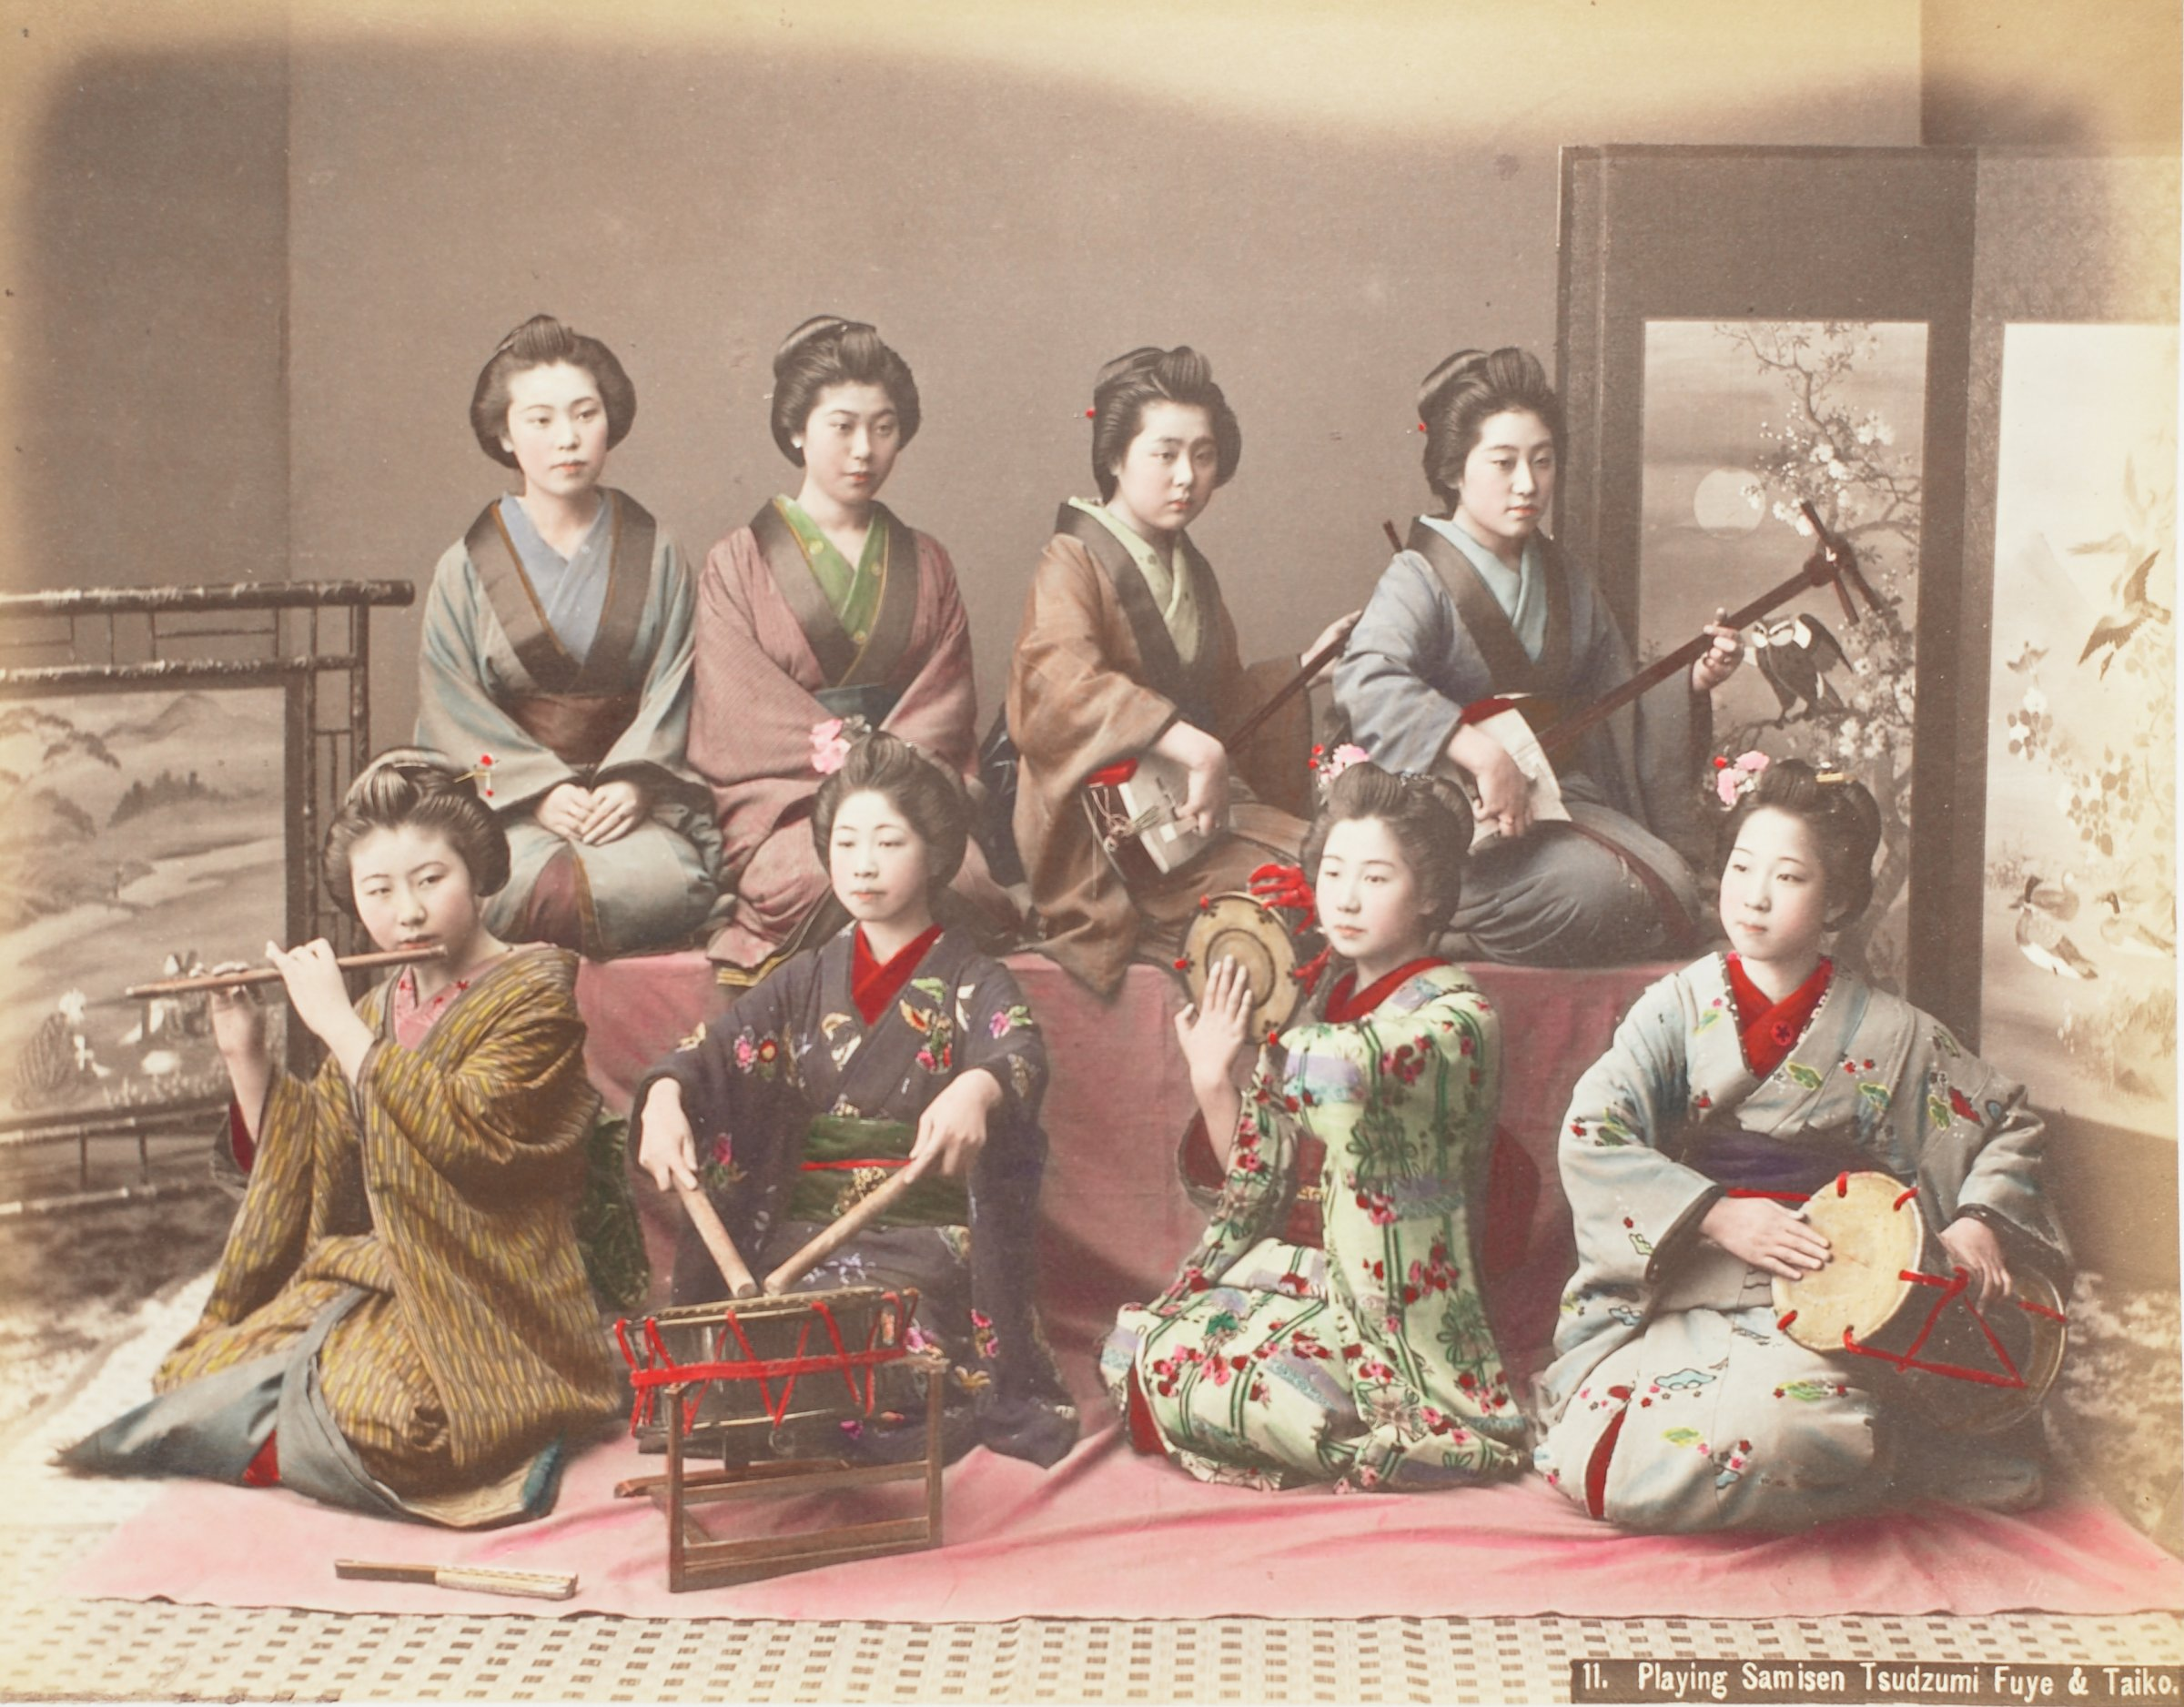 Weaving Silk (.12, recto); Playing Samisen Tsudzumi (.13, verso), Attributed to Kusakabe Kimbei, hand-colored albumen prints mounted to album page